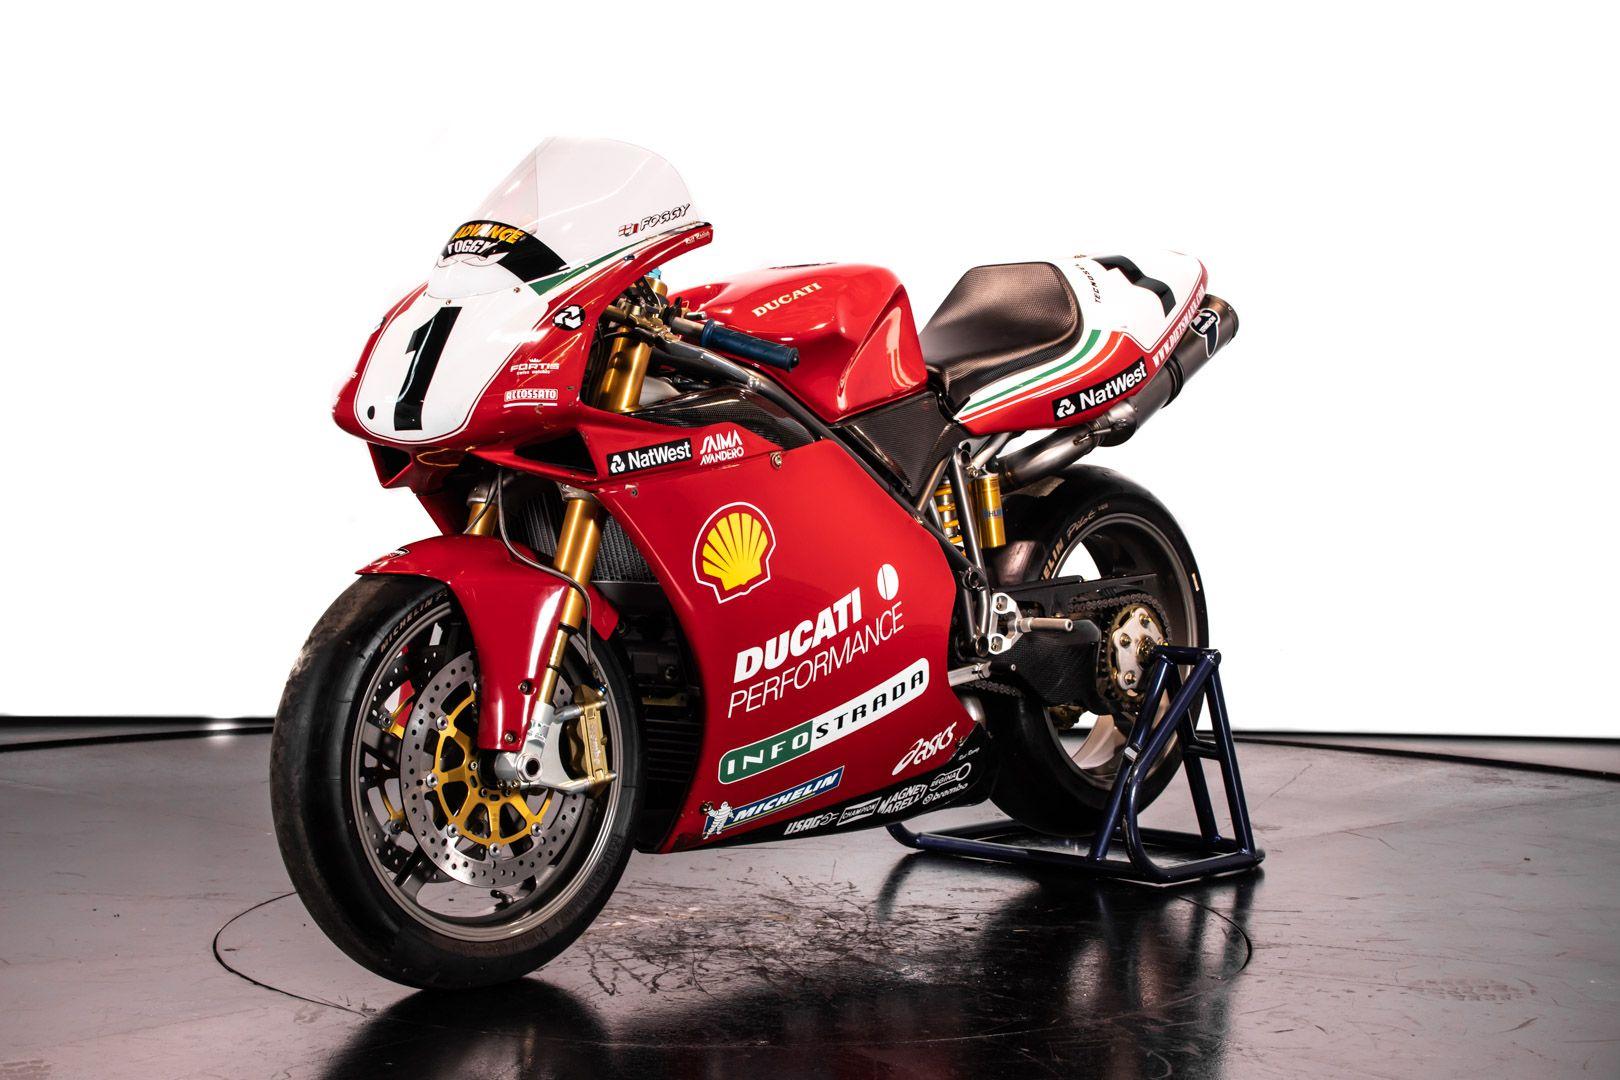 2008 Ducati 996 Fogarty Evocation 03/12 84209